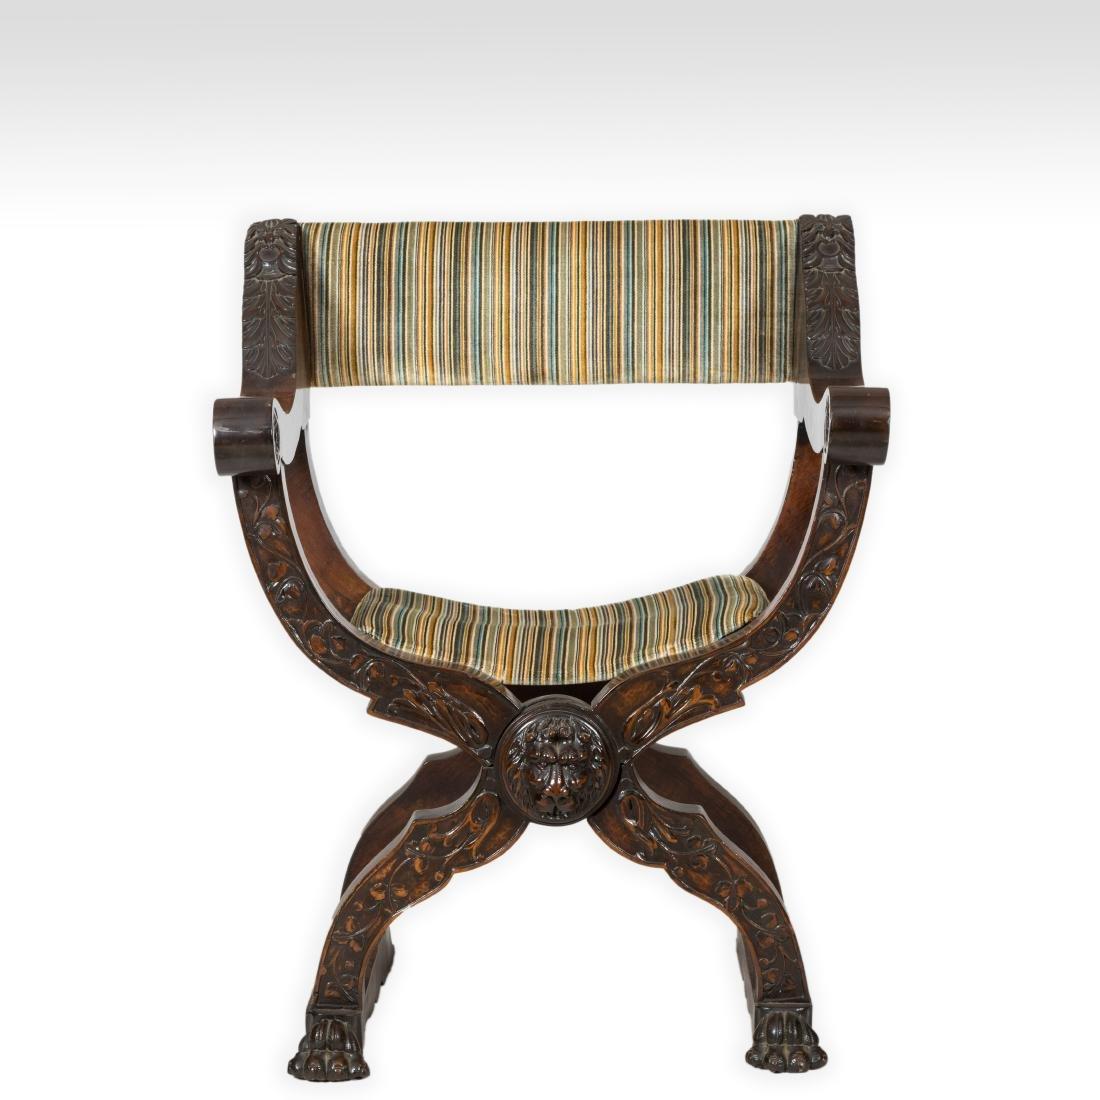 Figural Carved Savonarola Chair